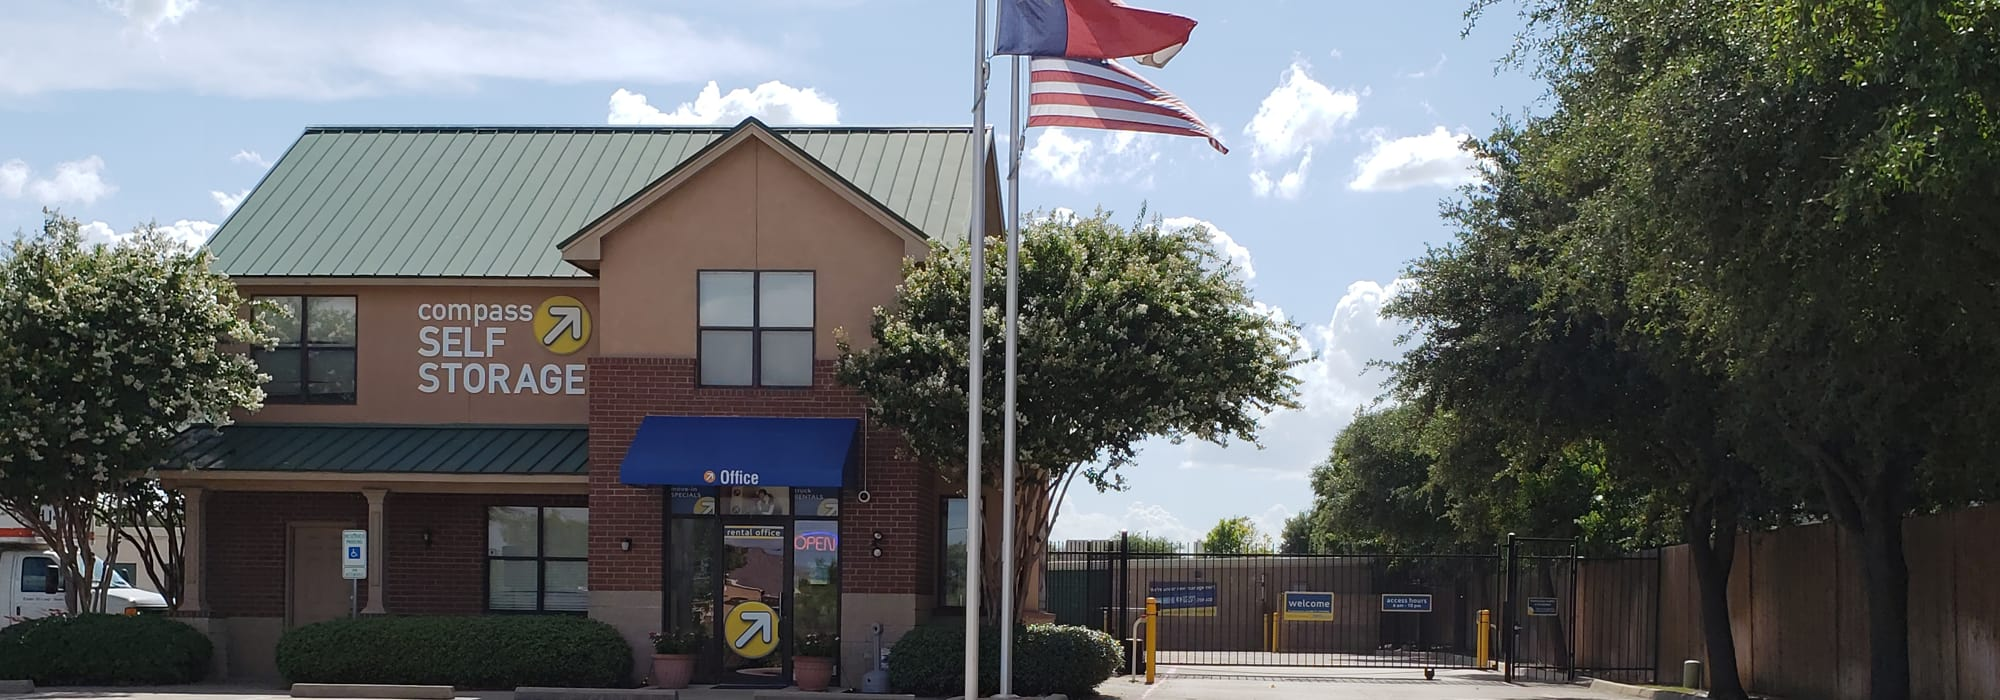 Self storage in Fort Worth TX